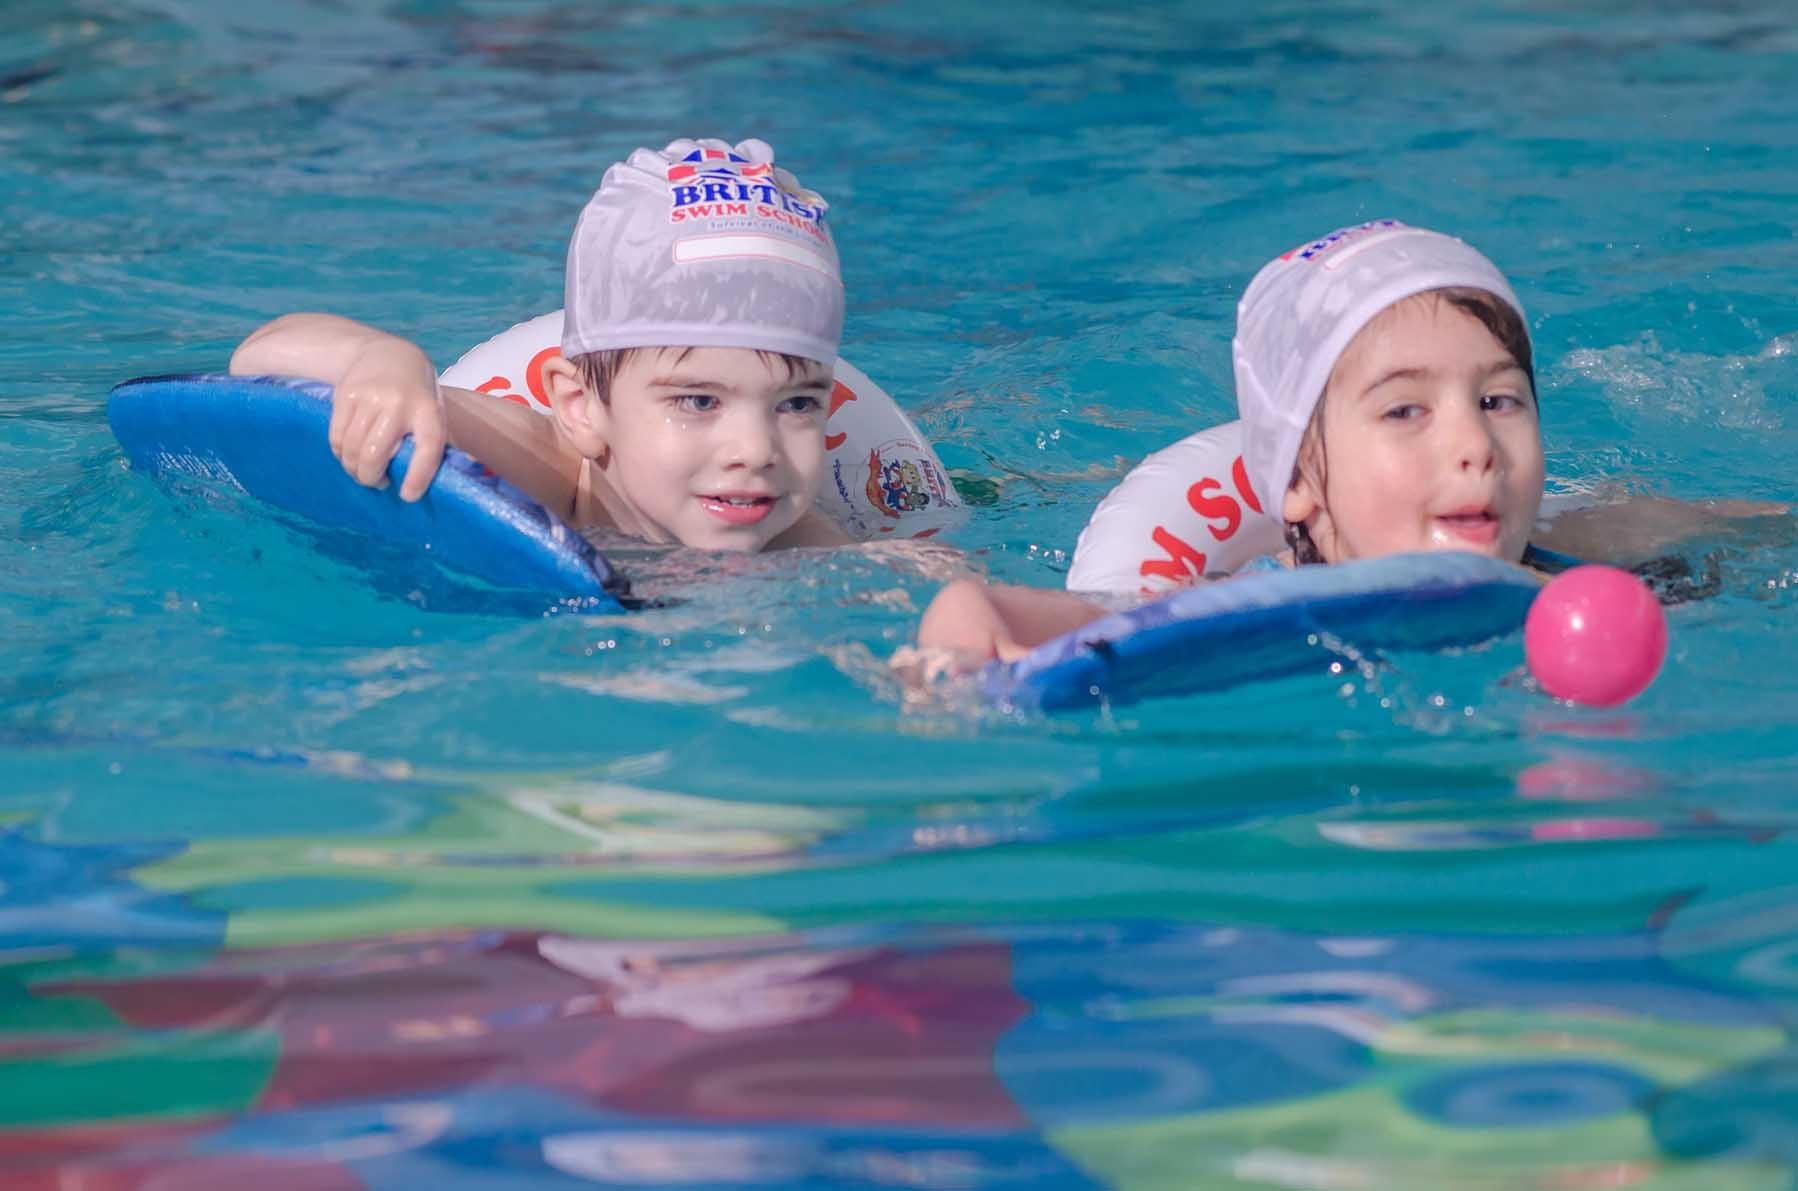 british swim school dublin at hilton garden inn 500 metro pl n 1 dublin oh 43017 ypcom - Hilton Garden Inn Dublin Ohio